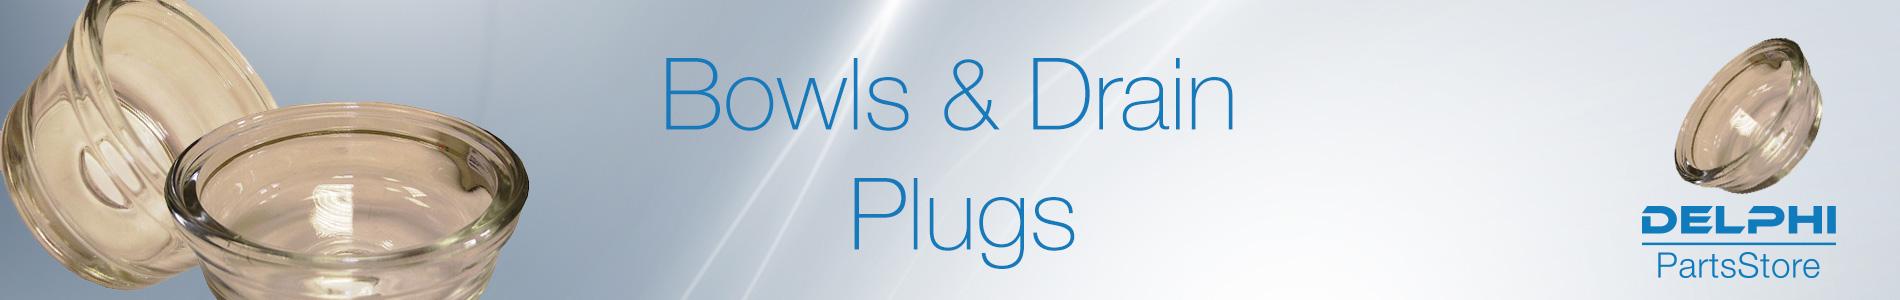 Bowls & Drain Plugs